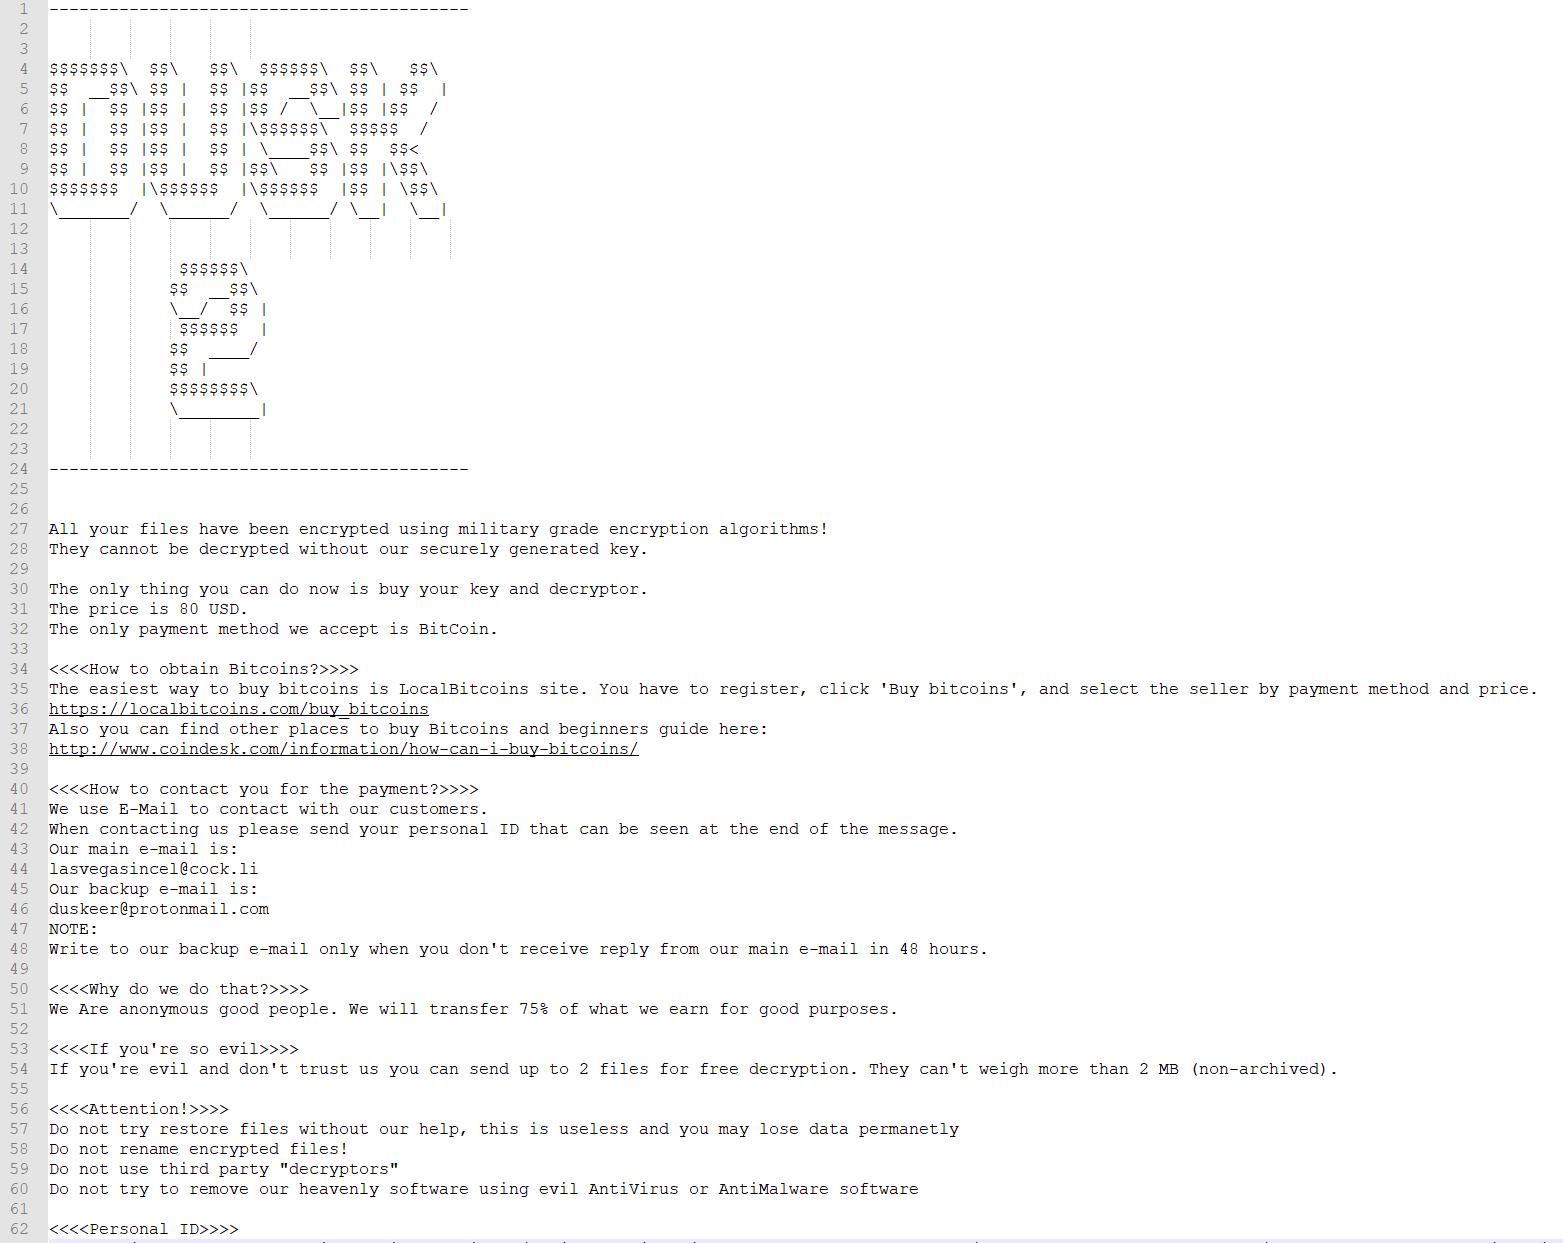 decrypt .Dusk 2 files